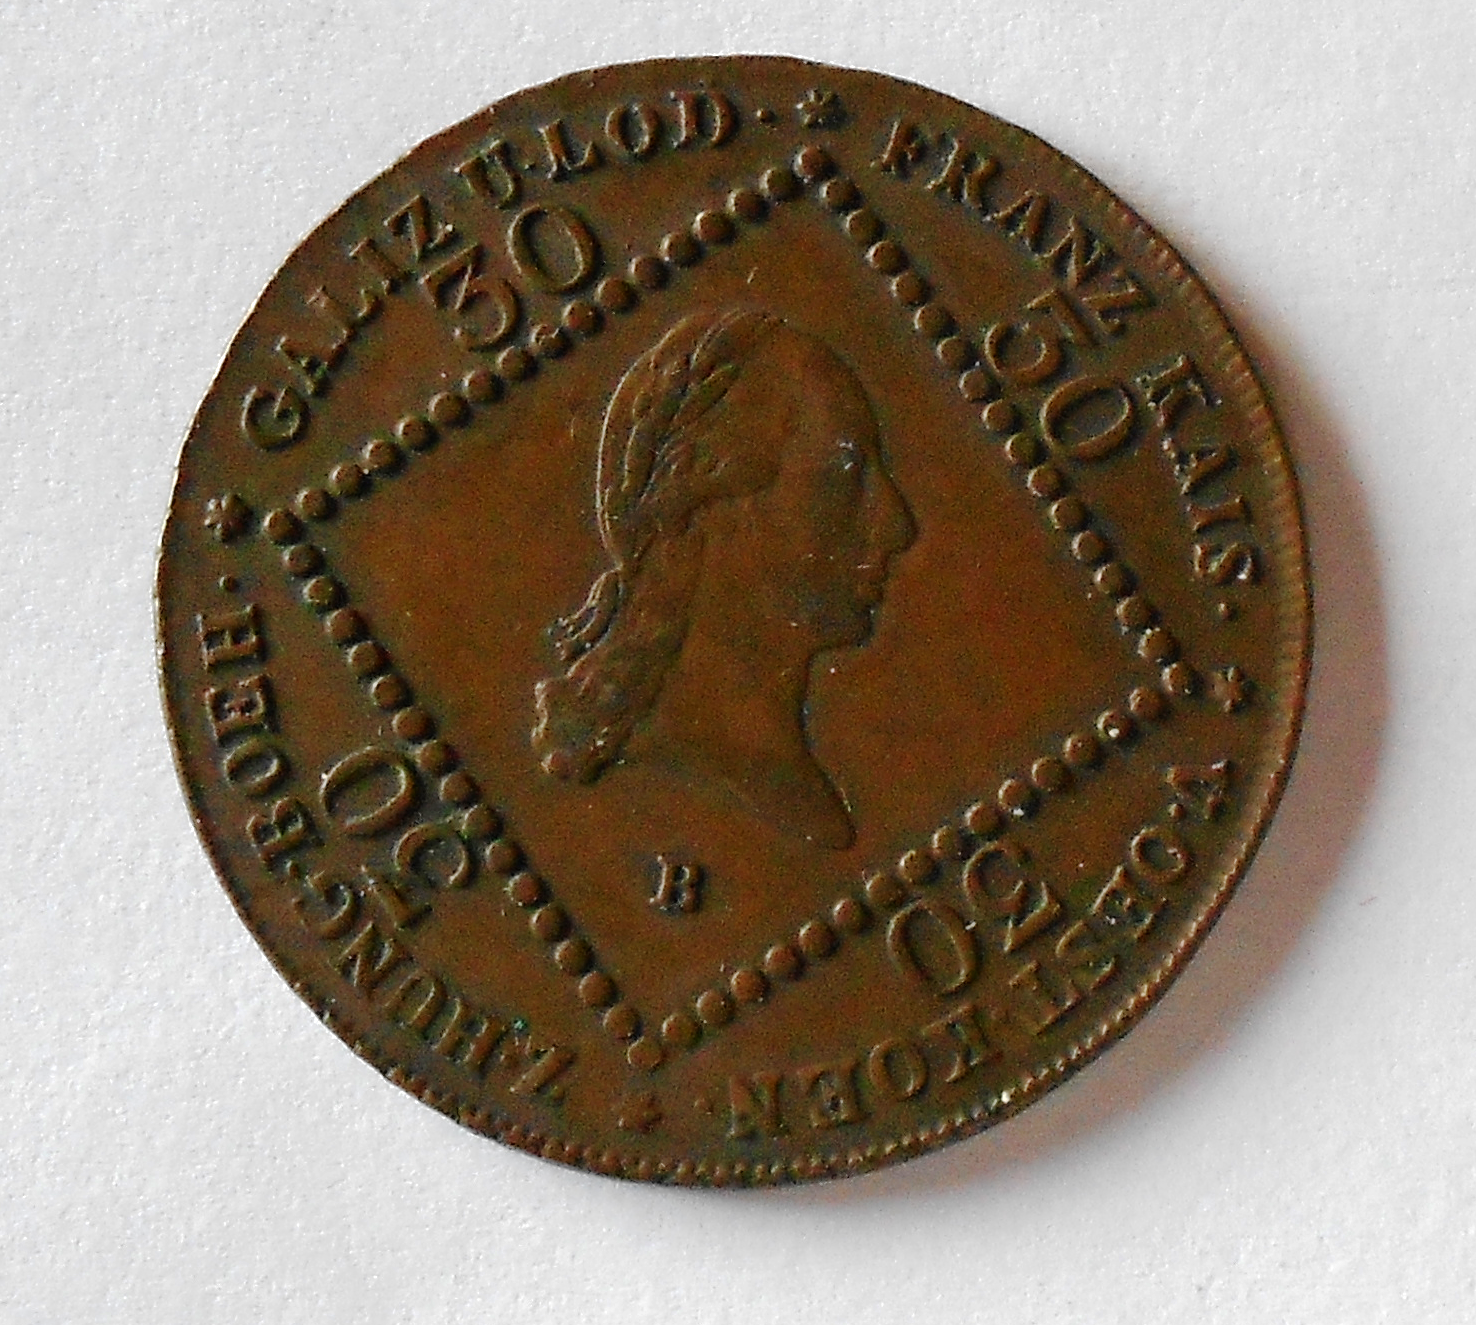 Uhry 30 Krejcar 1807 B František II. Stav